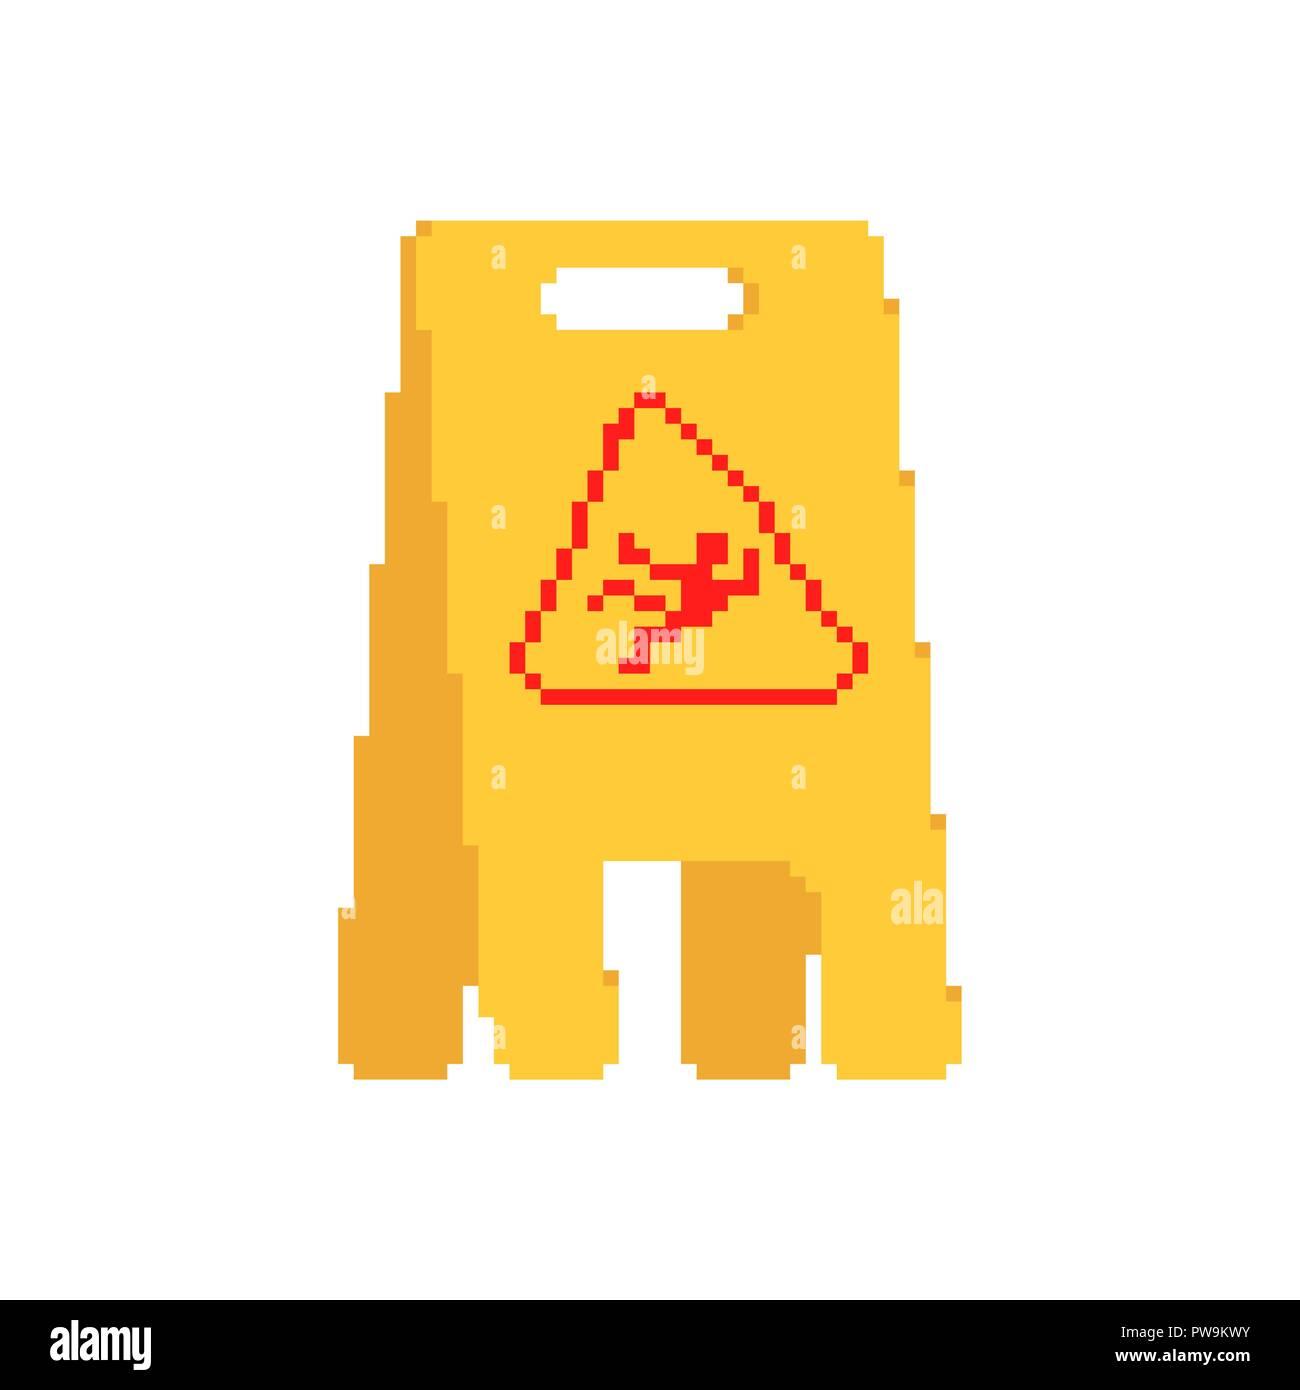 Wet floor yellow sign pixel art. 8 bit caution slippery accident - Stock Image